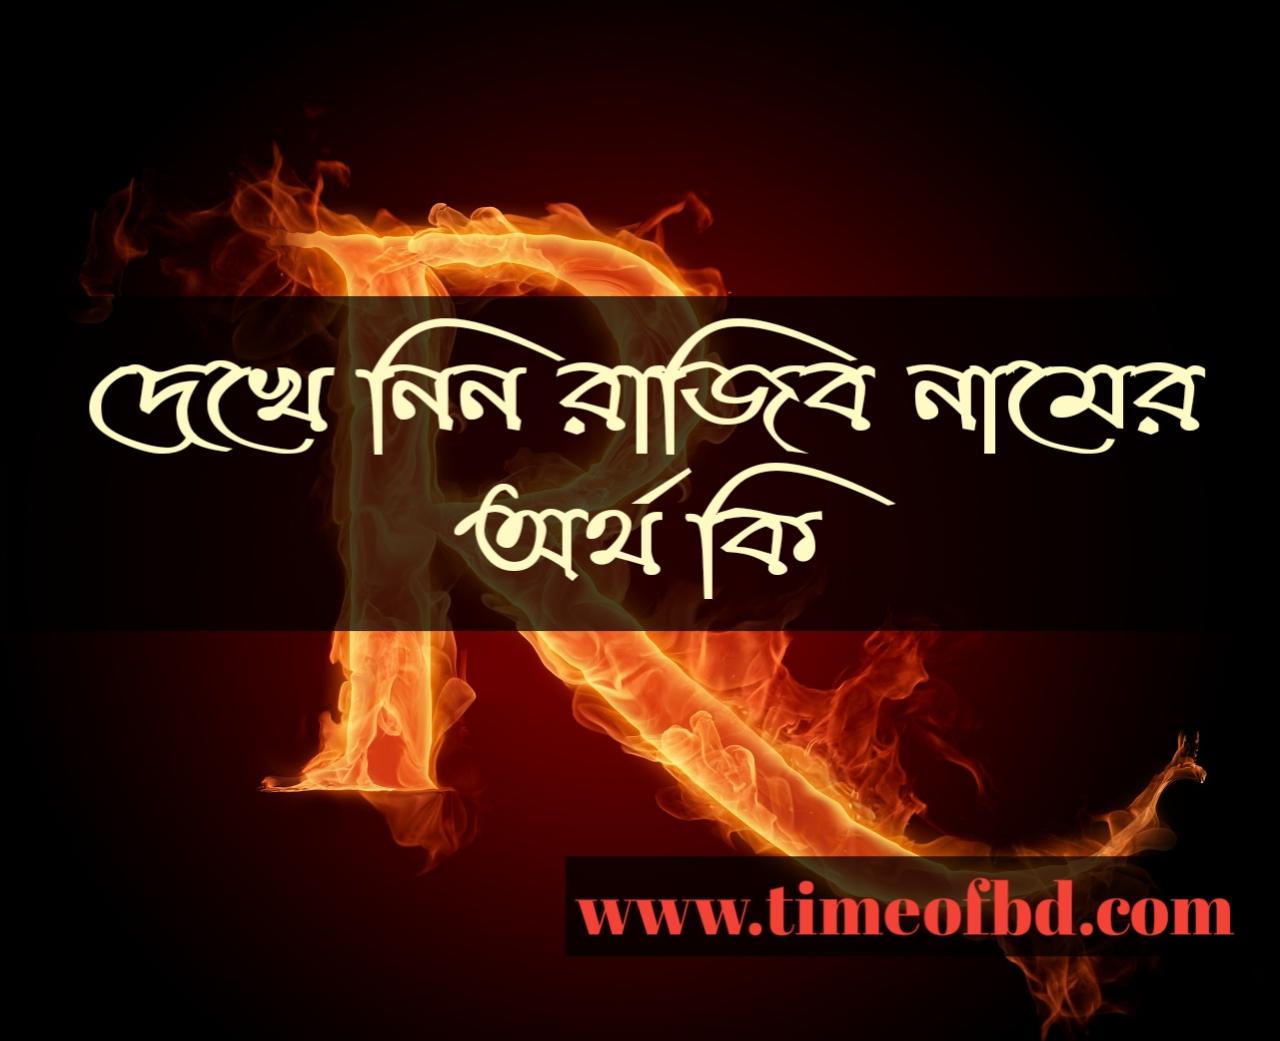 Rajib name meaning in Bengali, রাজিব নামের অর্থ কি, রাজিব নামের বাংলা অর্থ কি, রাজিব নামের ইসলামিক অর্থ কি,